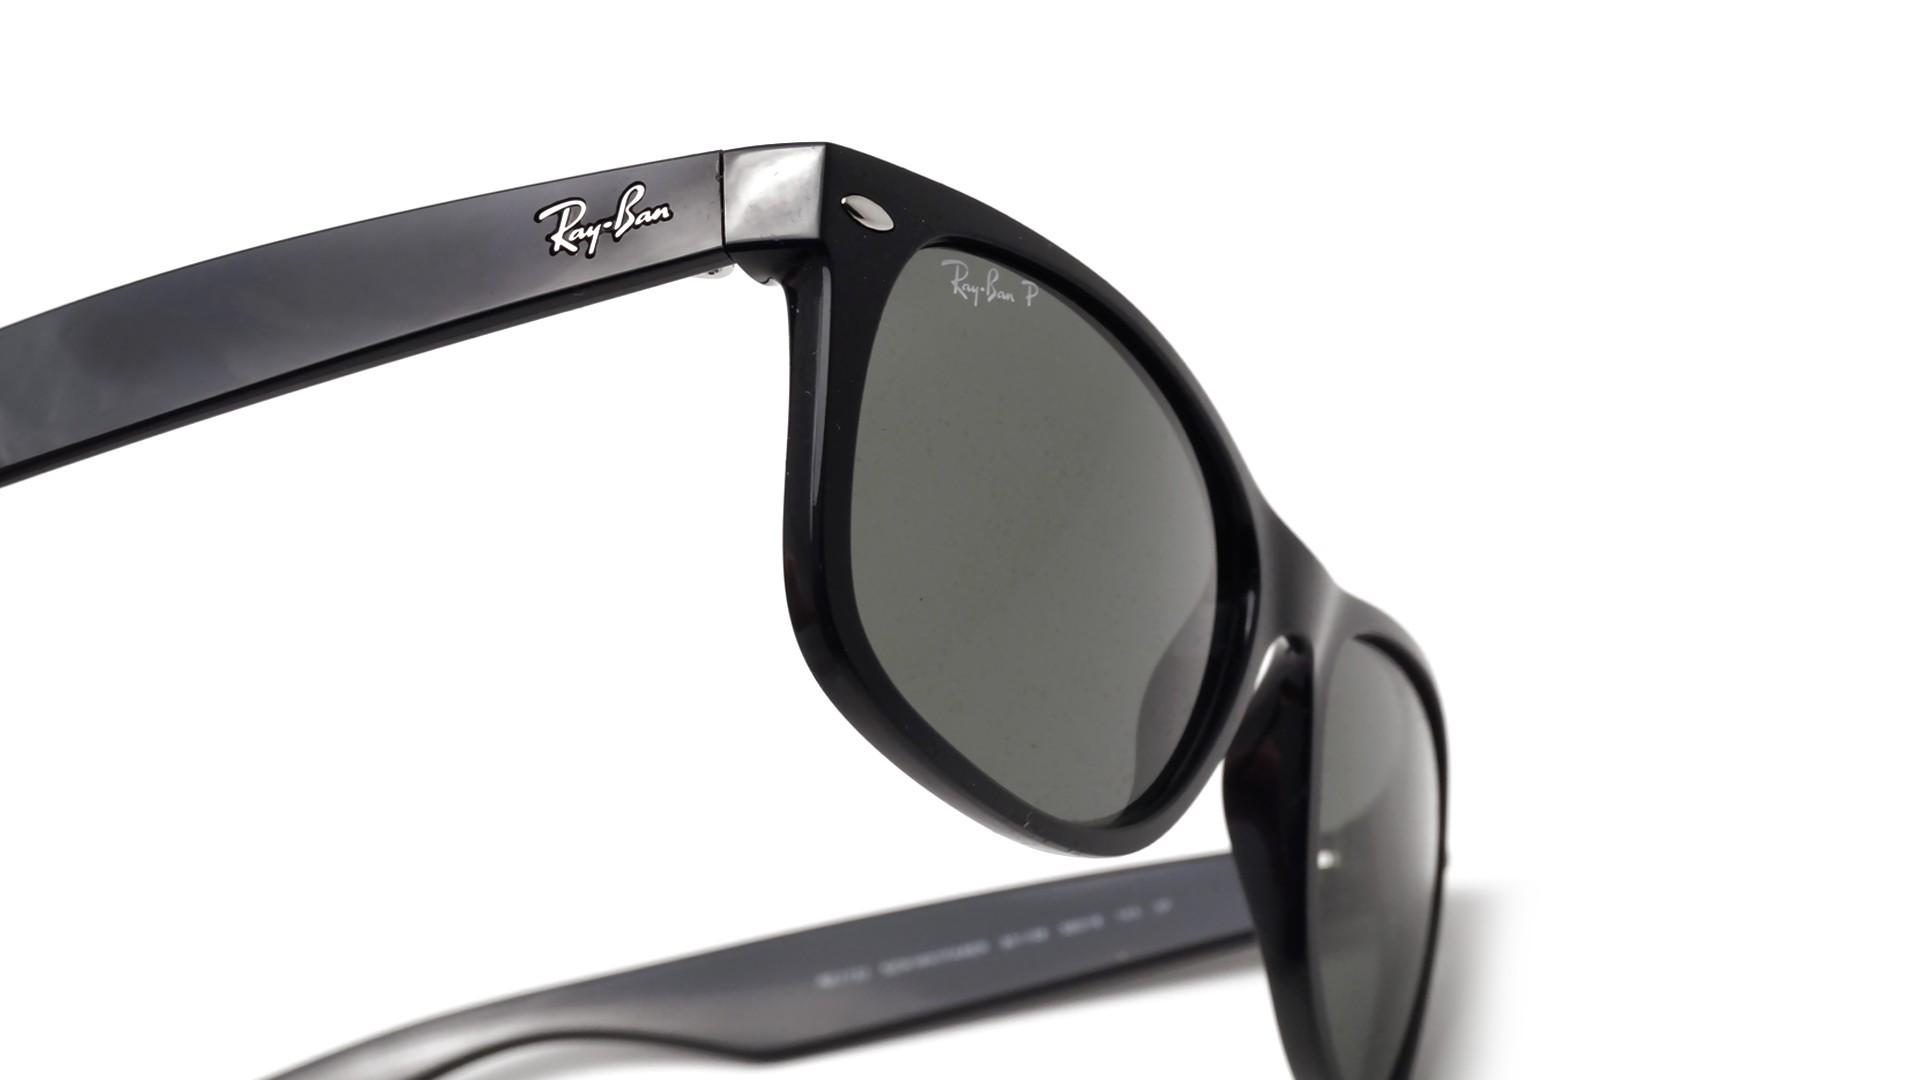 Sunglasses Ray-Ban New Wayfarer Black RB2132 901 58 55-18 Large Polarized a3578cc4945f